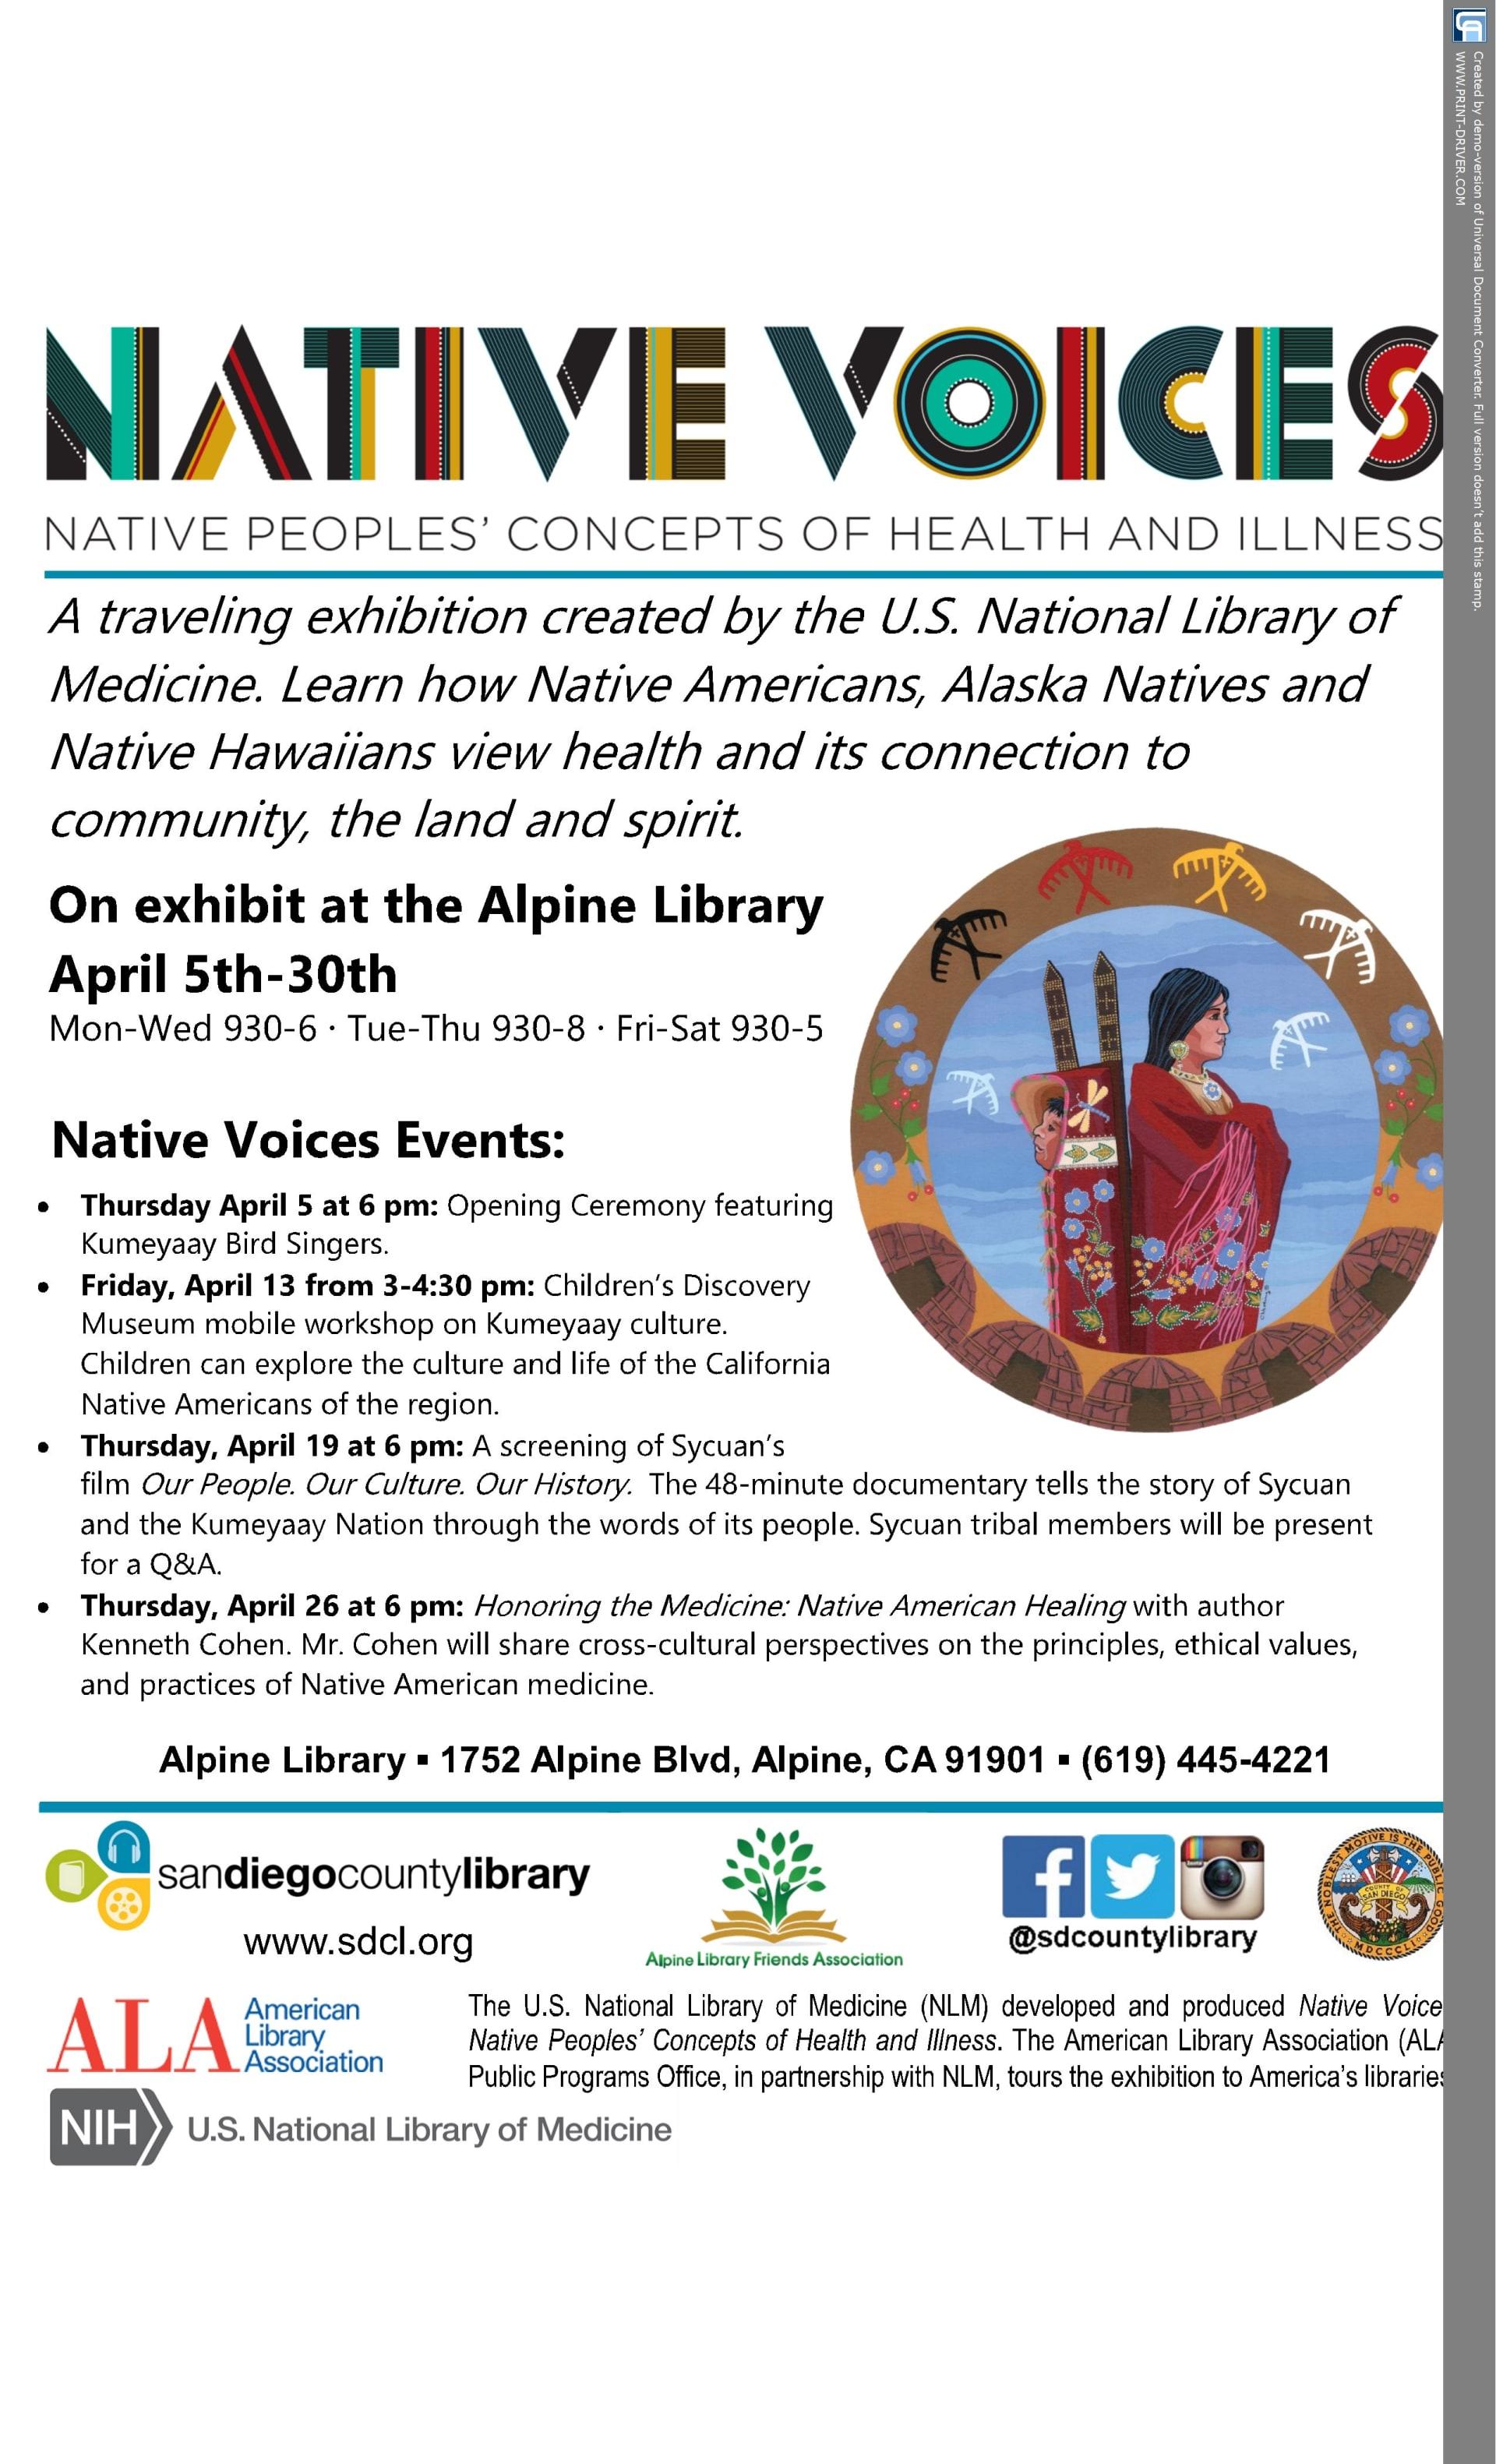 Native-Voices-Flyer-JPEG-w1920.jpg